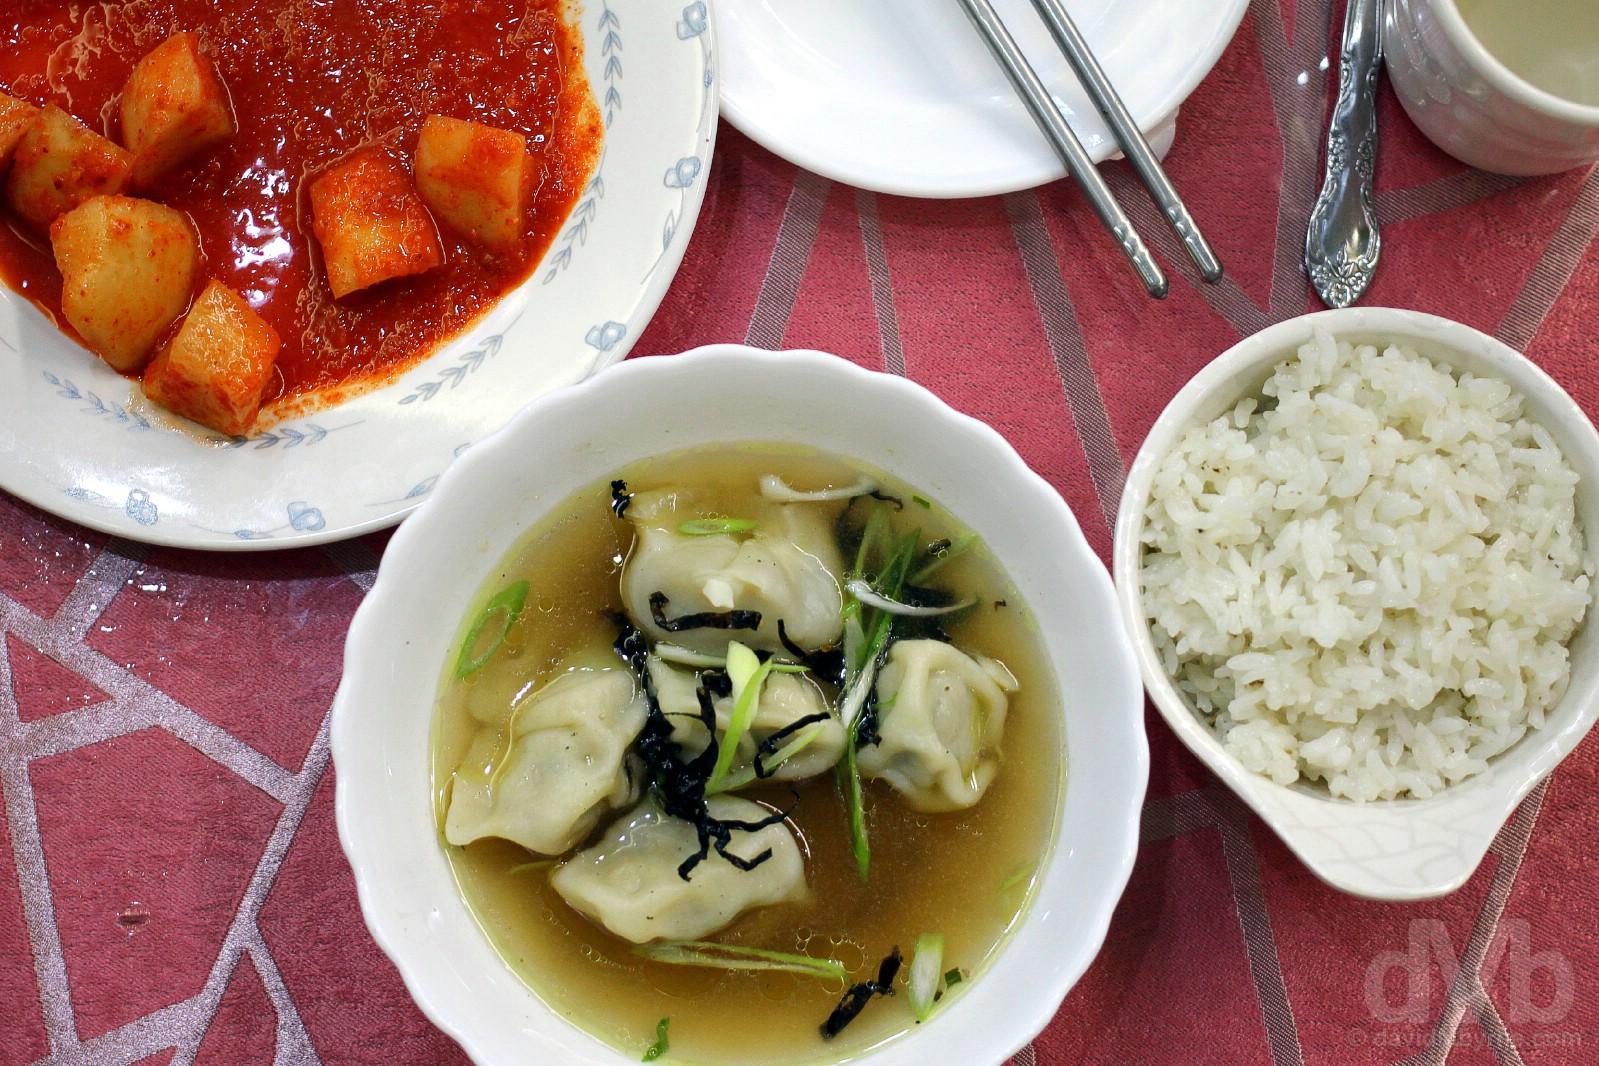 Lunch. Dumpling soup, Pyongyang, North Korea. August 15, 2017.